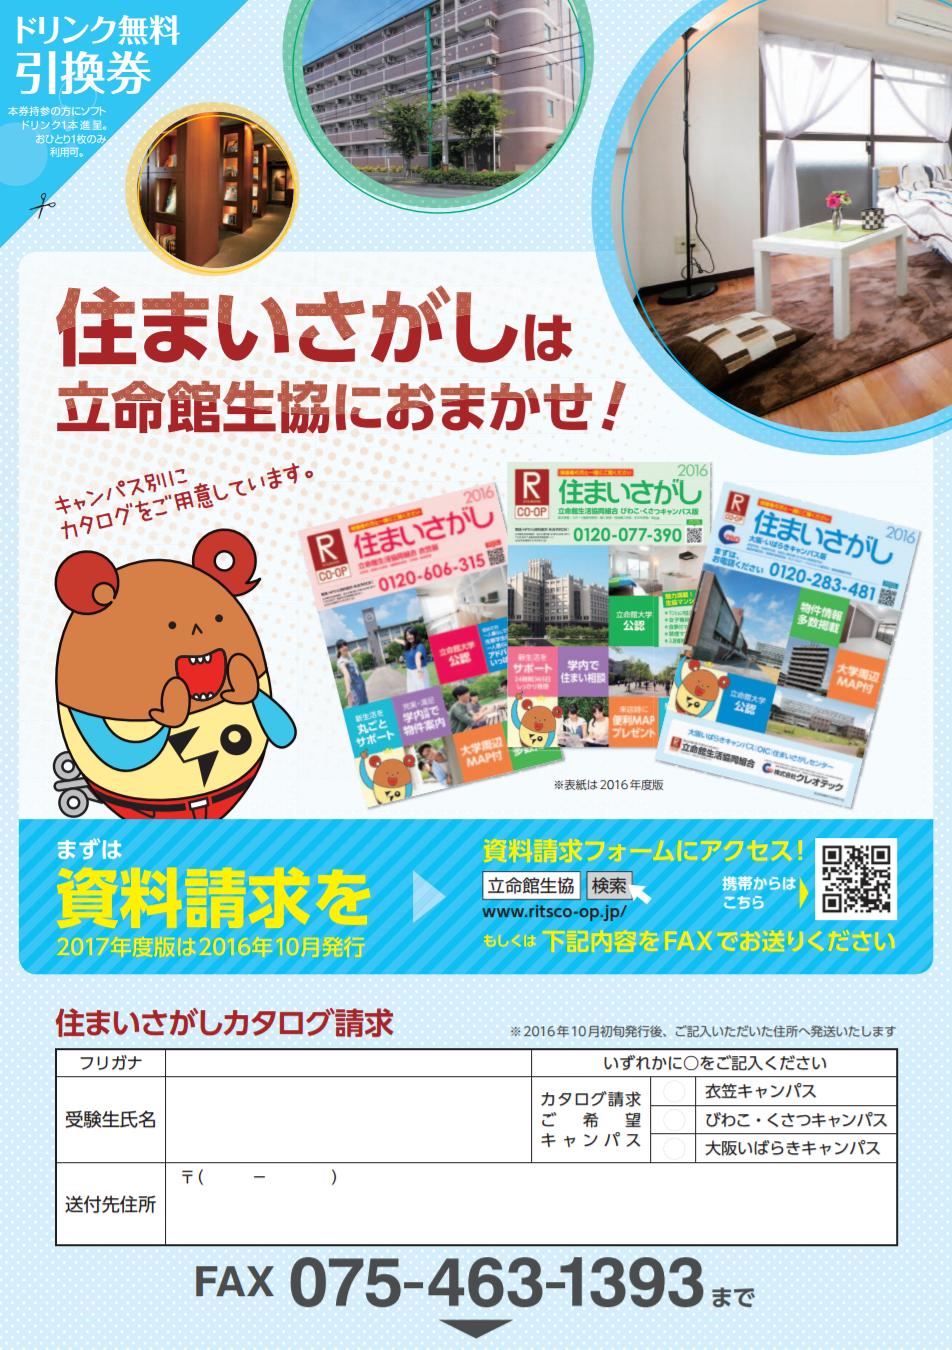 http://www.ritsco-op.jp/pickup/20160809_img02.png